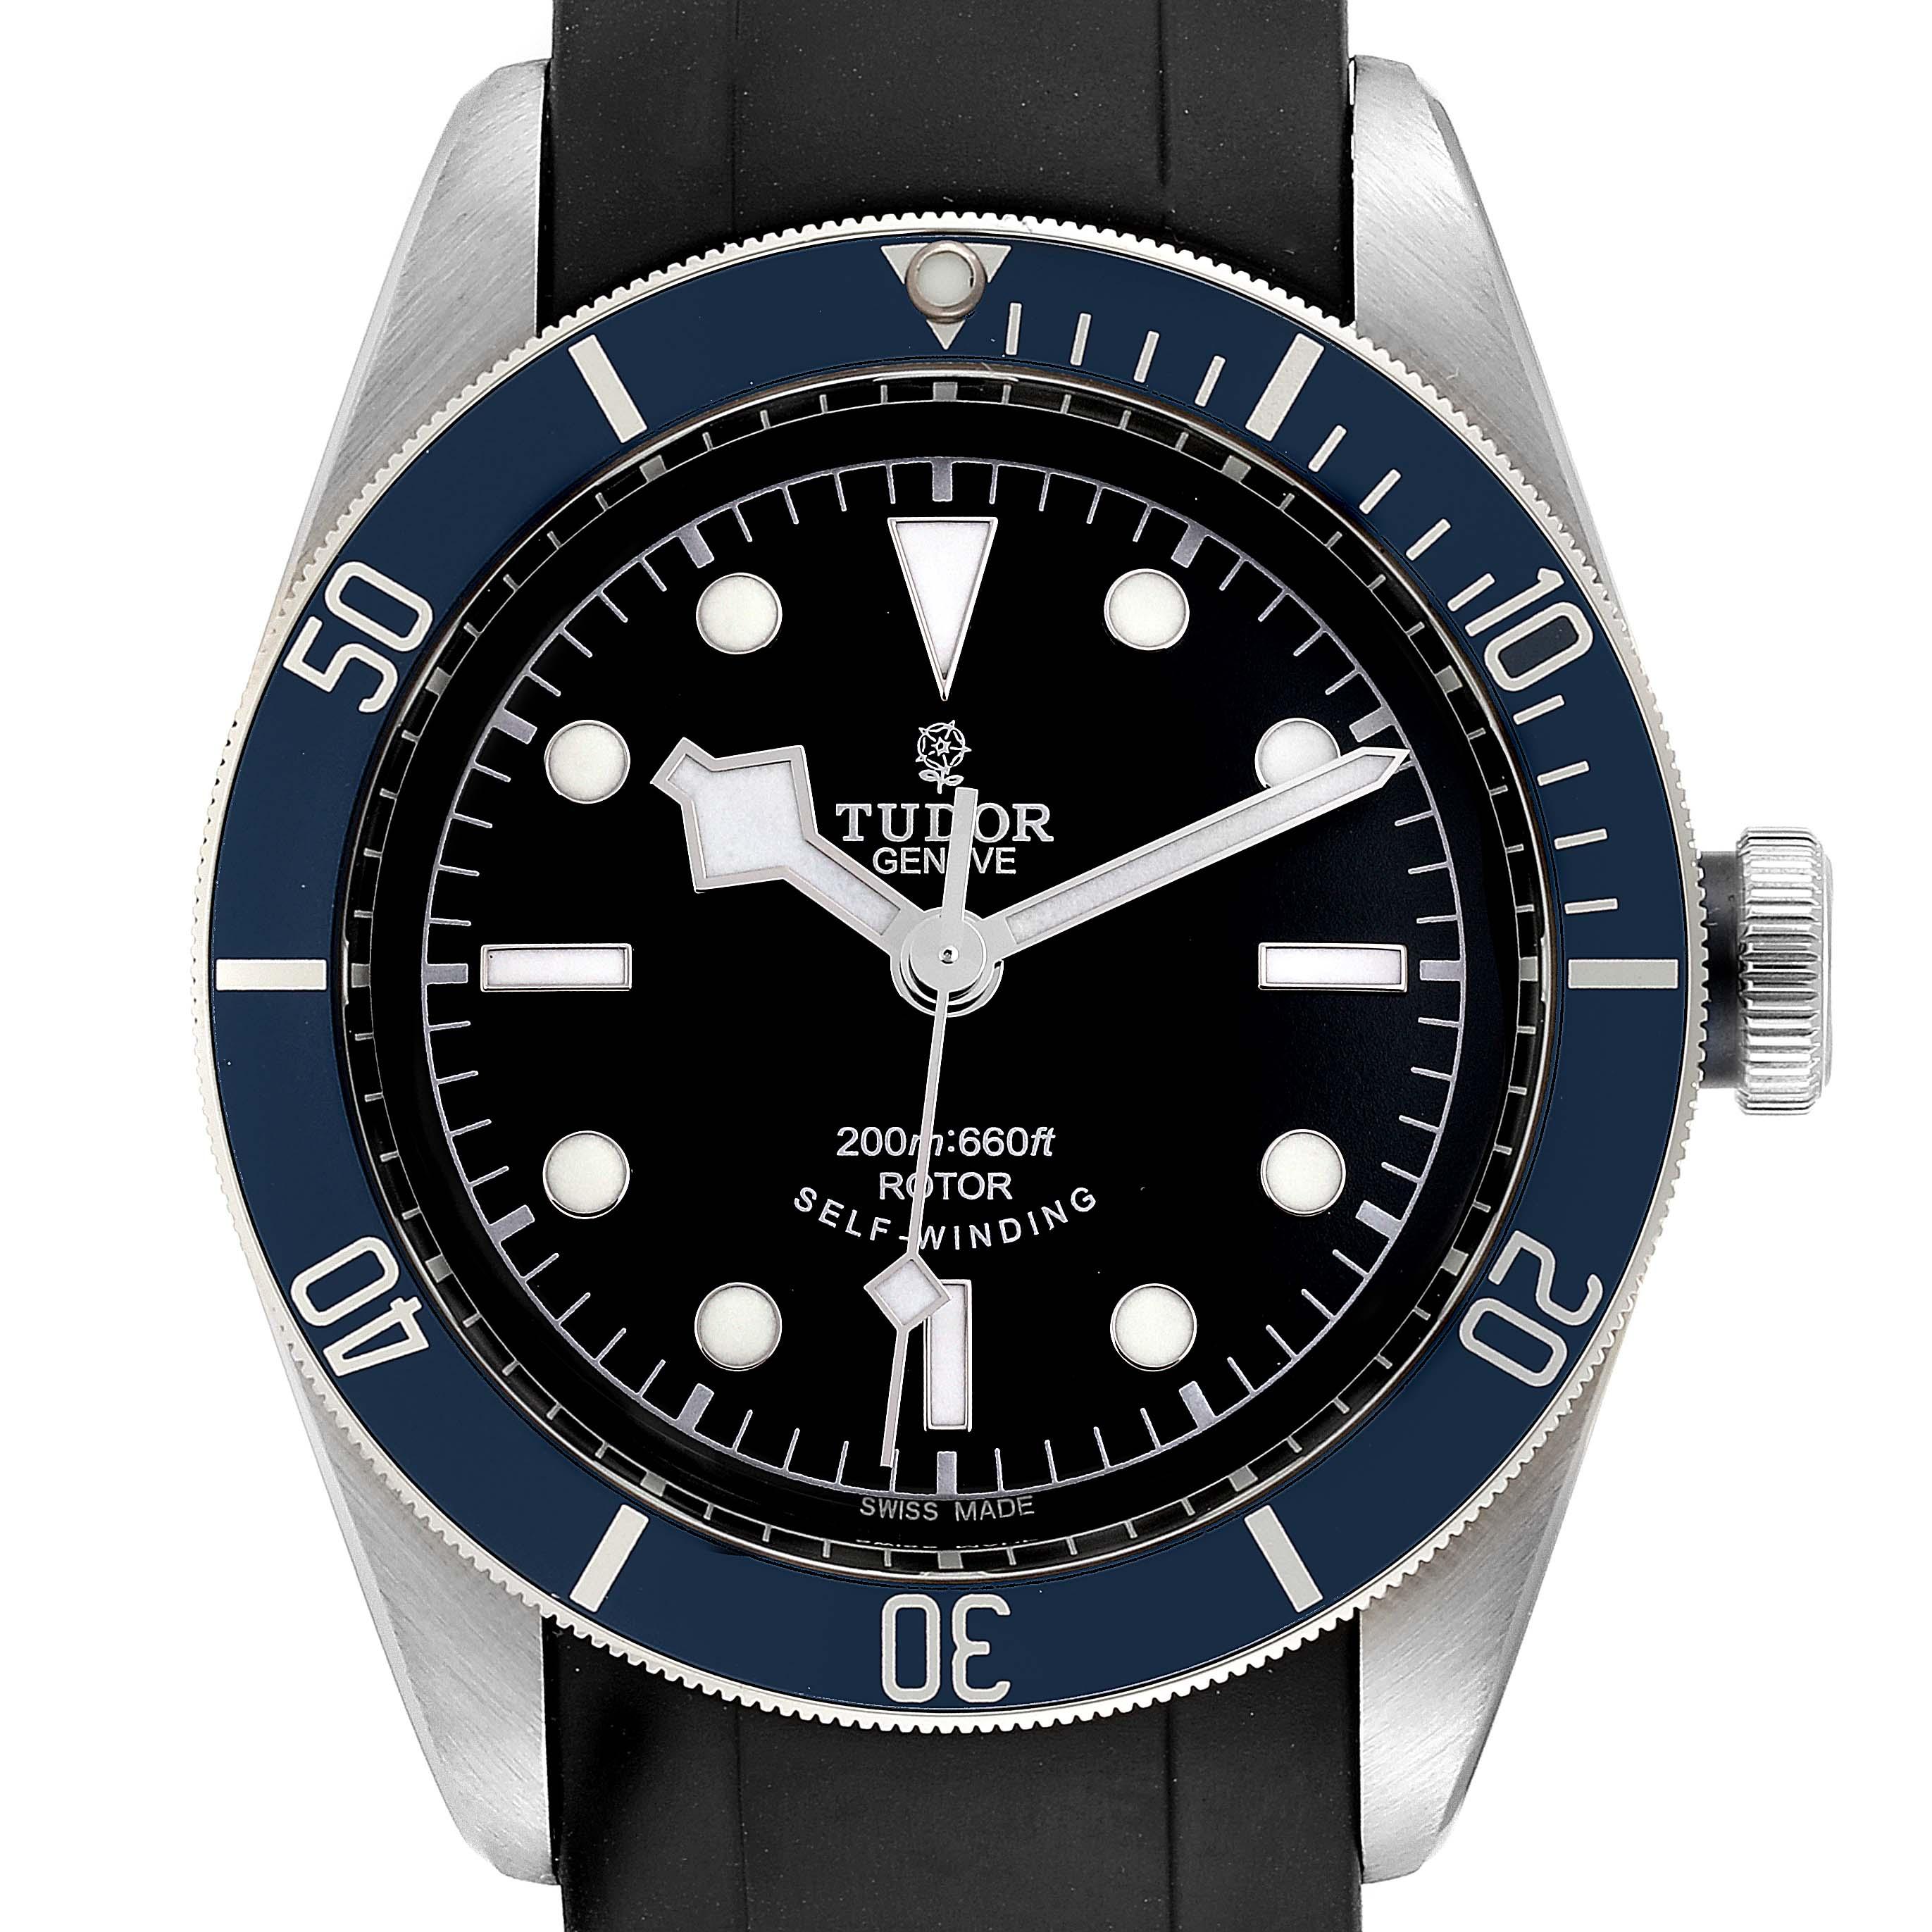 Photo of Tudor Heritage Black Bay Blue Bezel Steel Watch 79220B Box Card